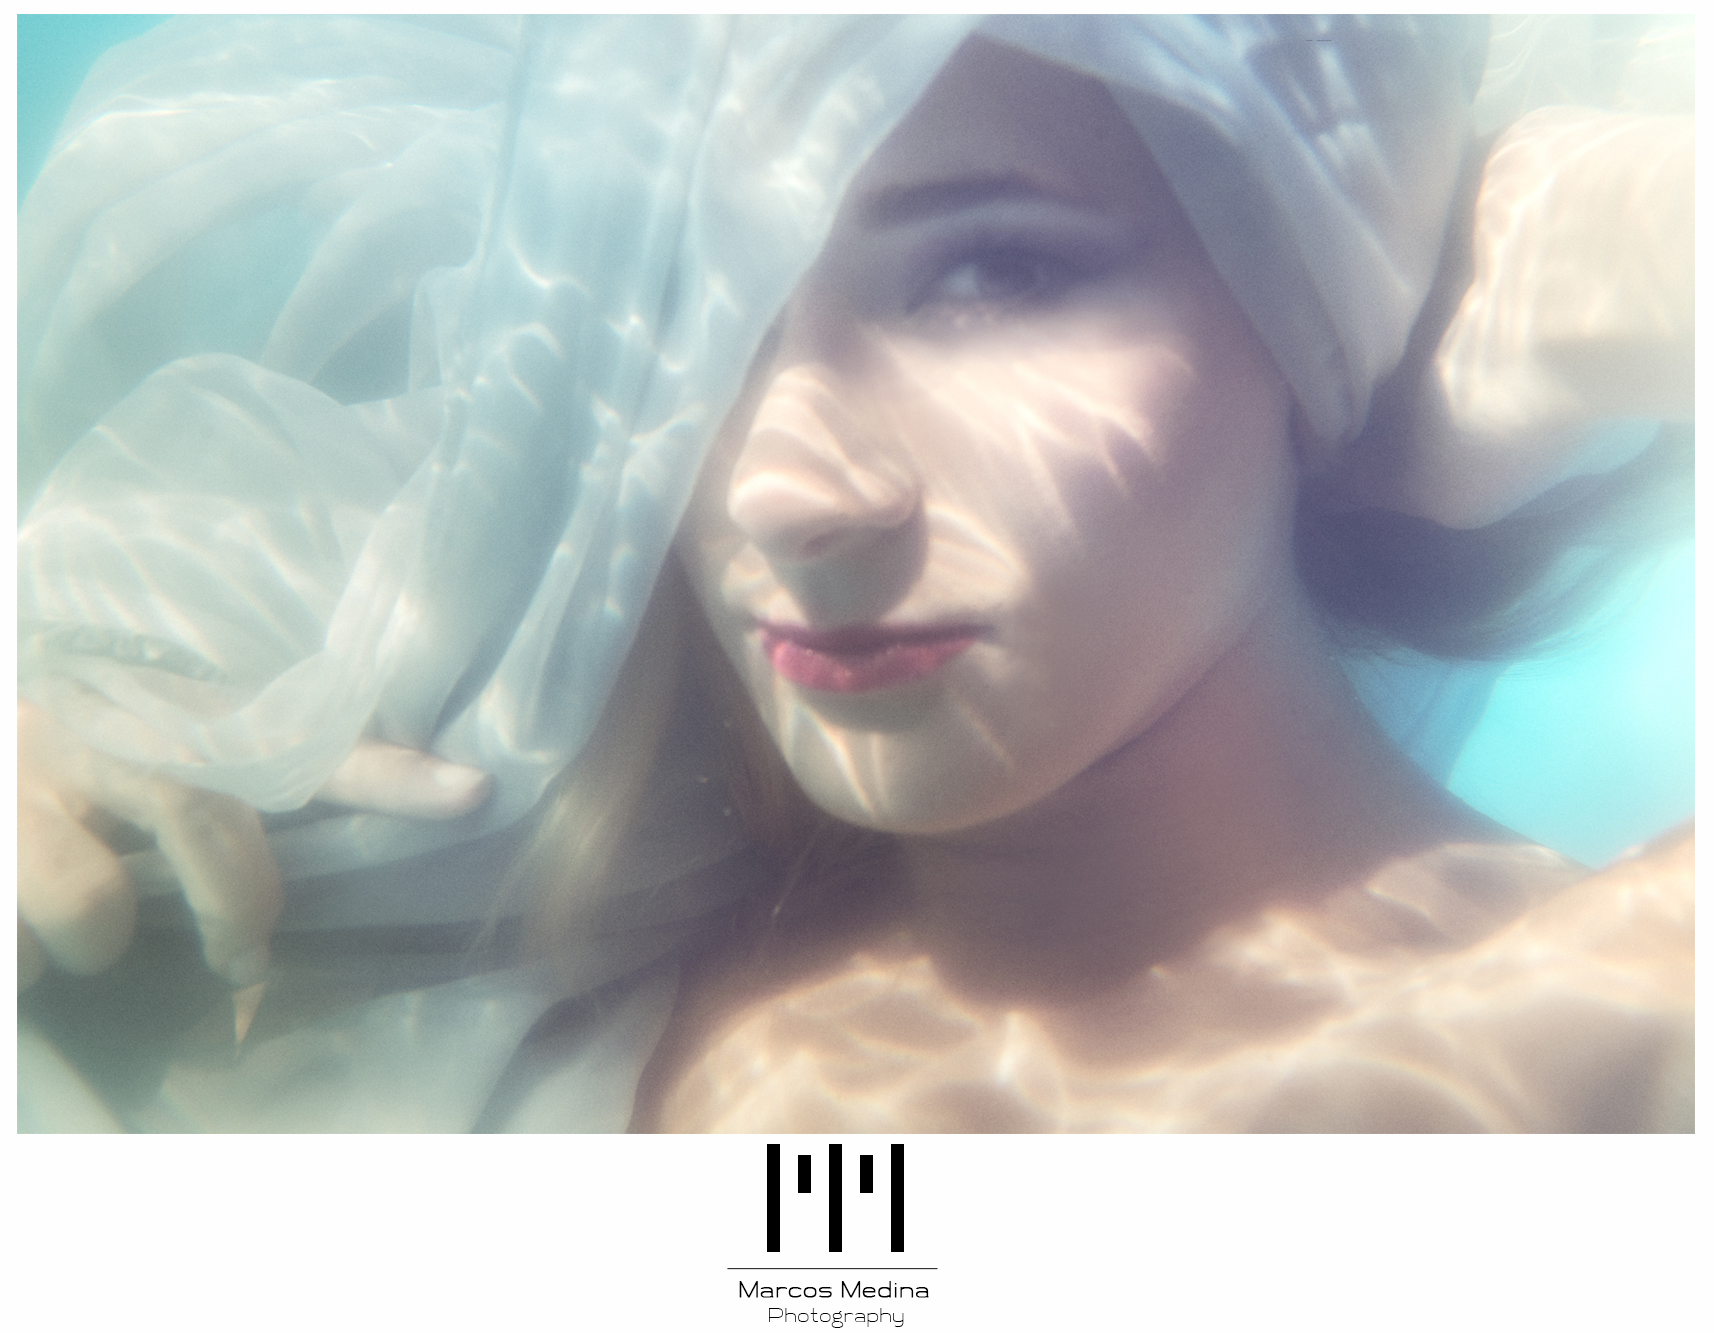 Marcos_Medina_Photography_Sirenas_6